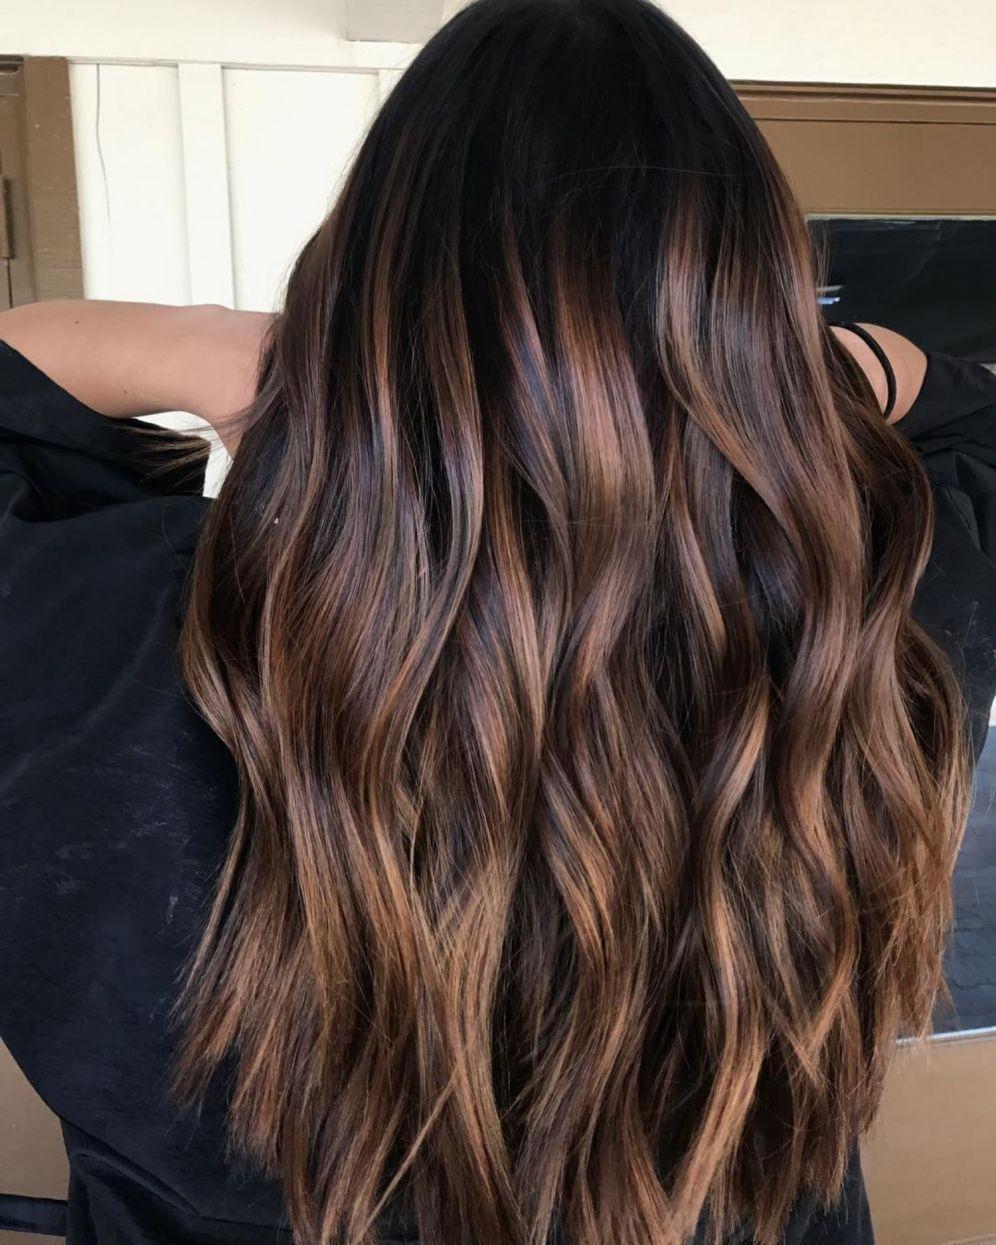 Long Brown Hair With Caramel Highlights In 2020 Hair Color For Black Hair Brown Hair With Highlights Long Brown Hair